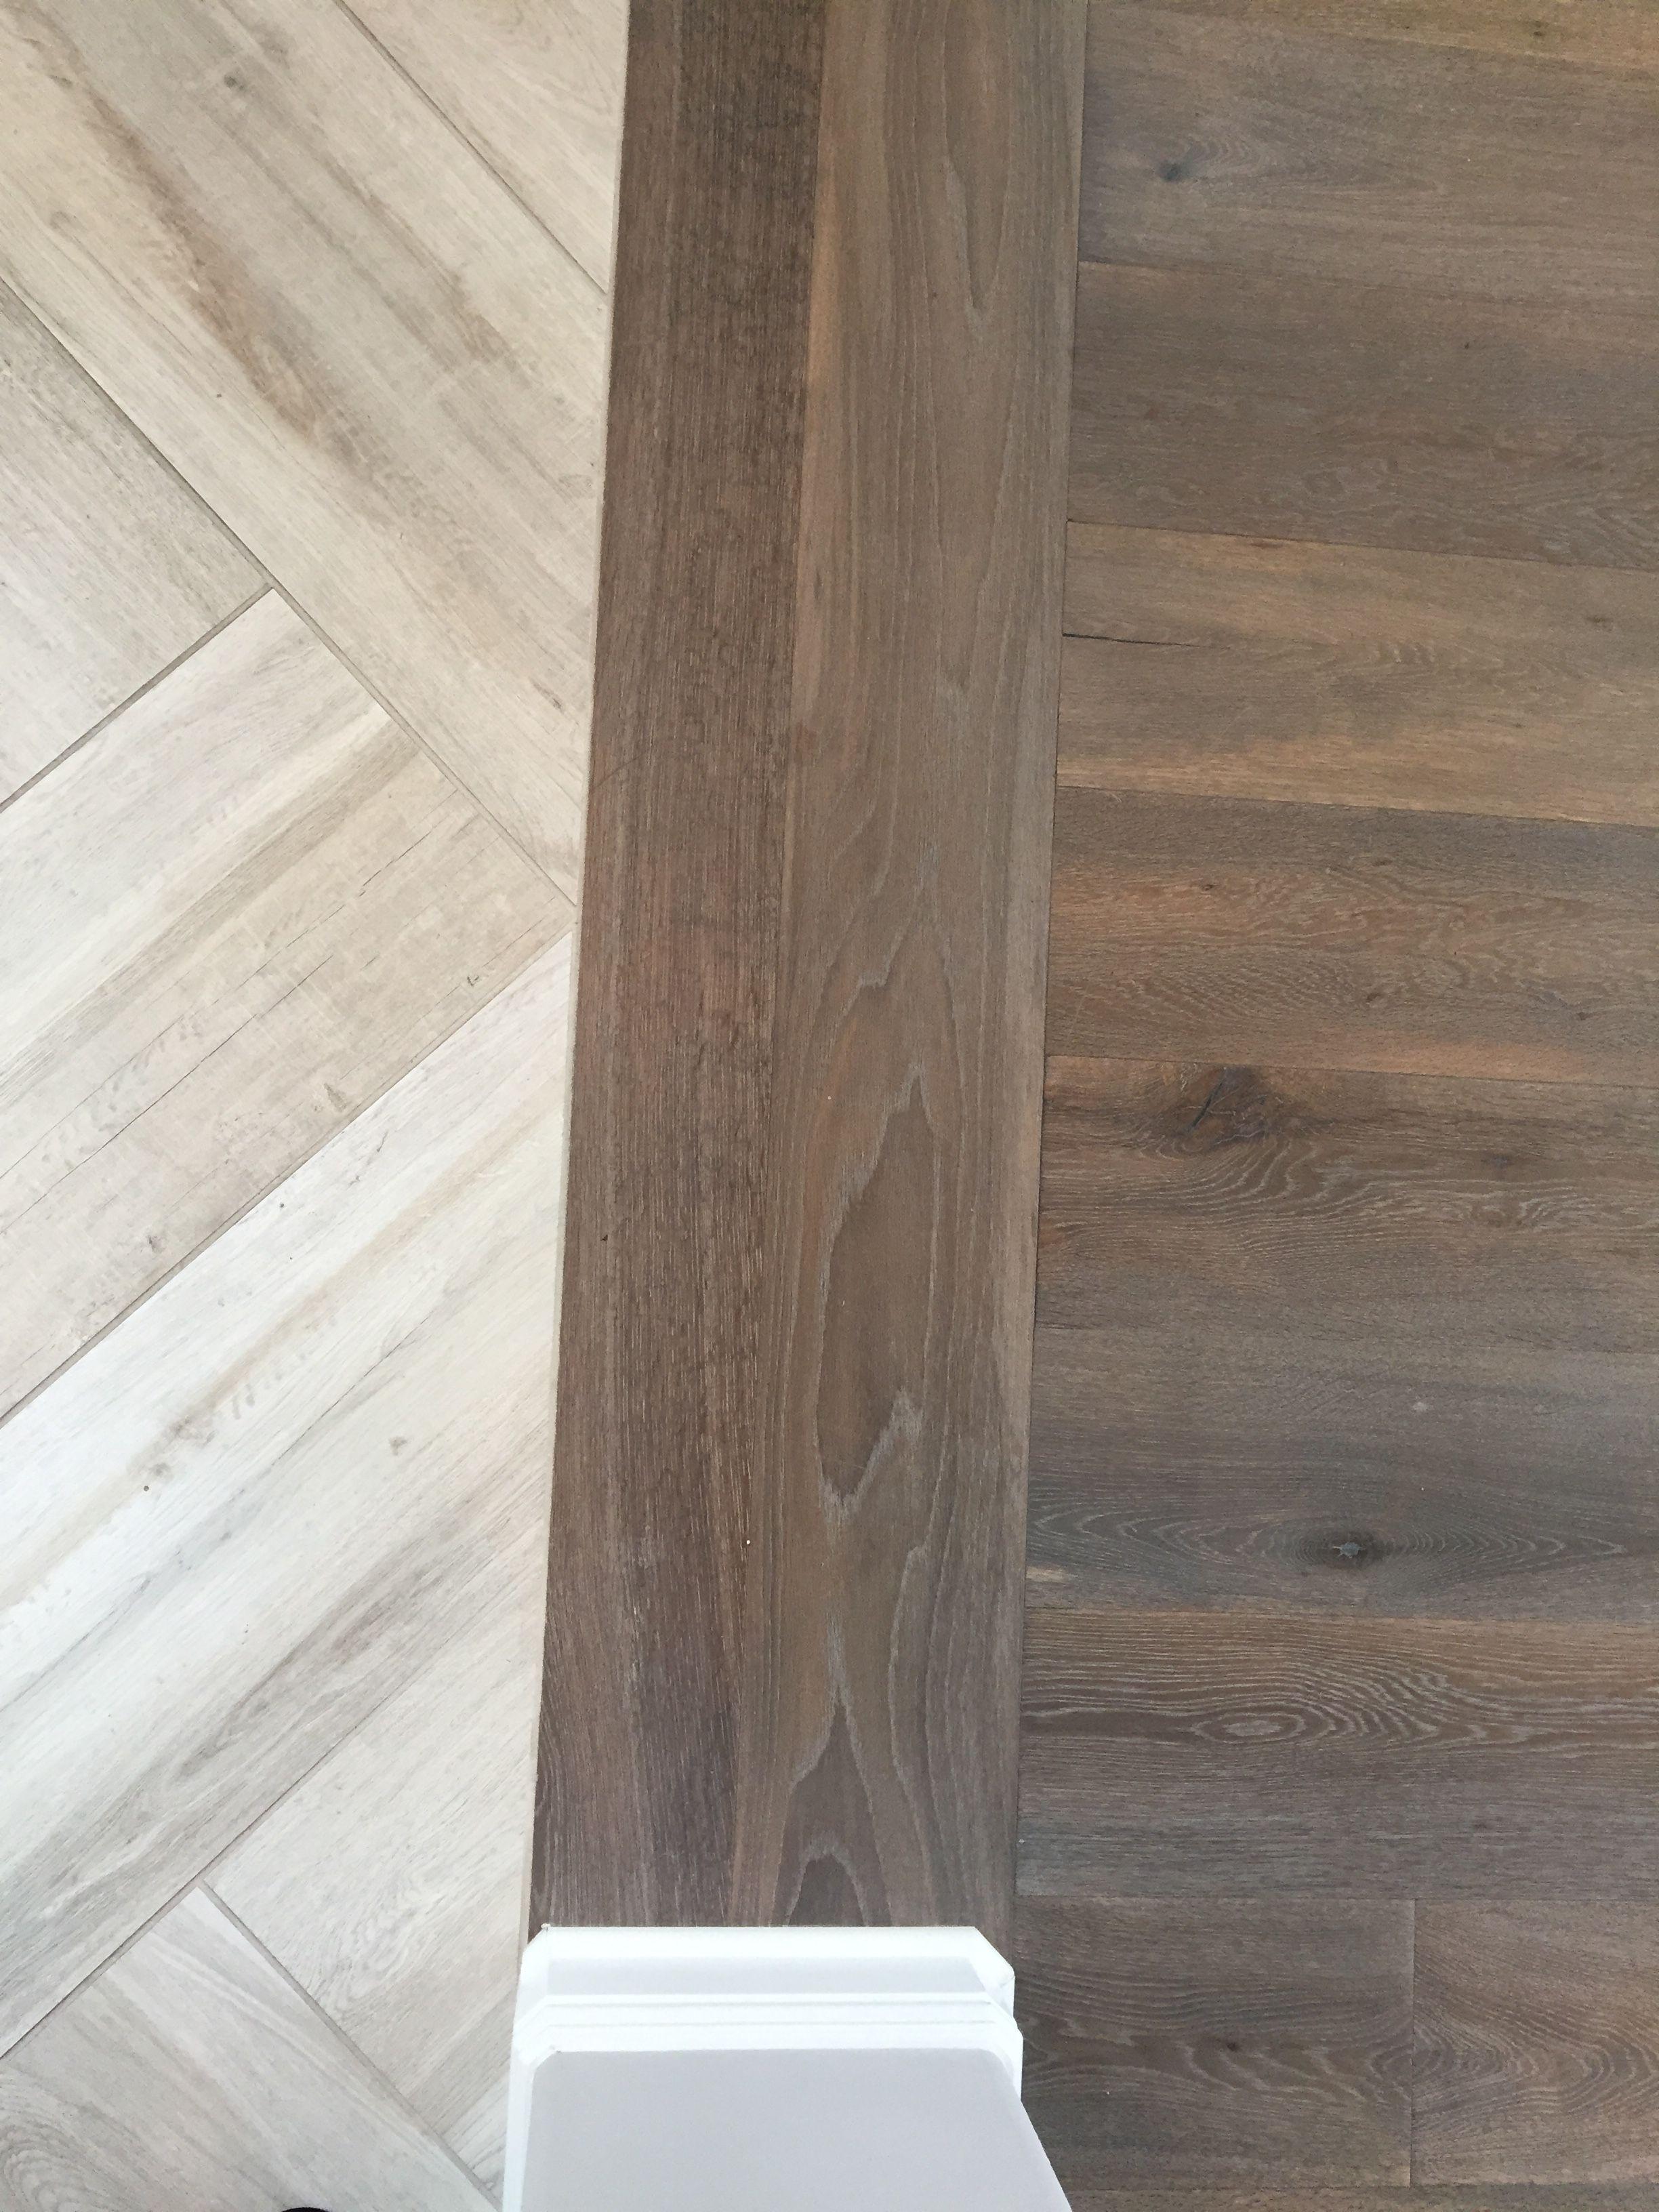 cost of refinishing hardwood floors vs replacing of floor transition laminate to herringbone tile pattern model within floor transition laminate to herringbone tile pattern herringbone tile pattern herringbone wood floor